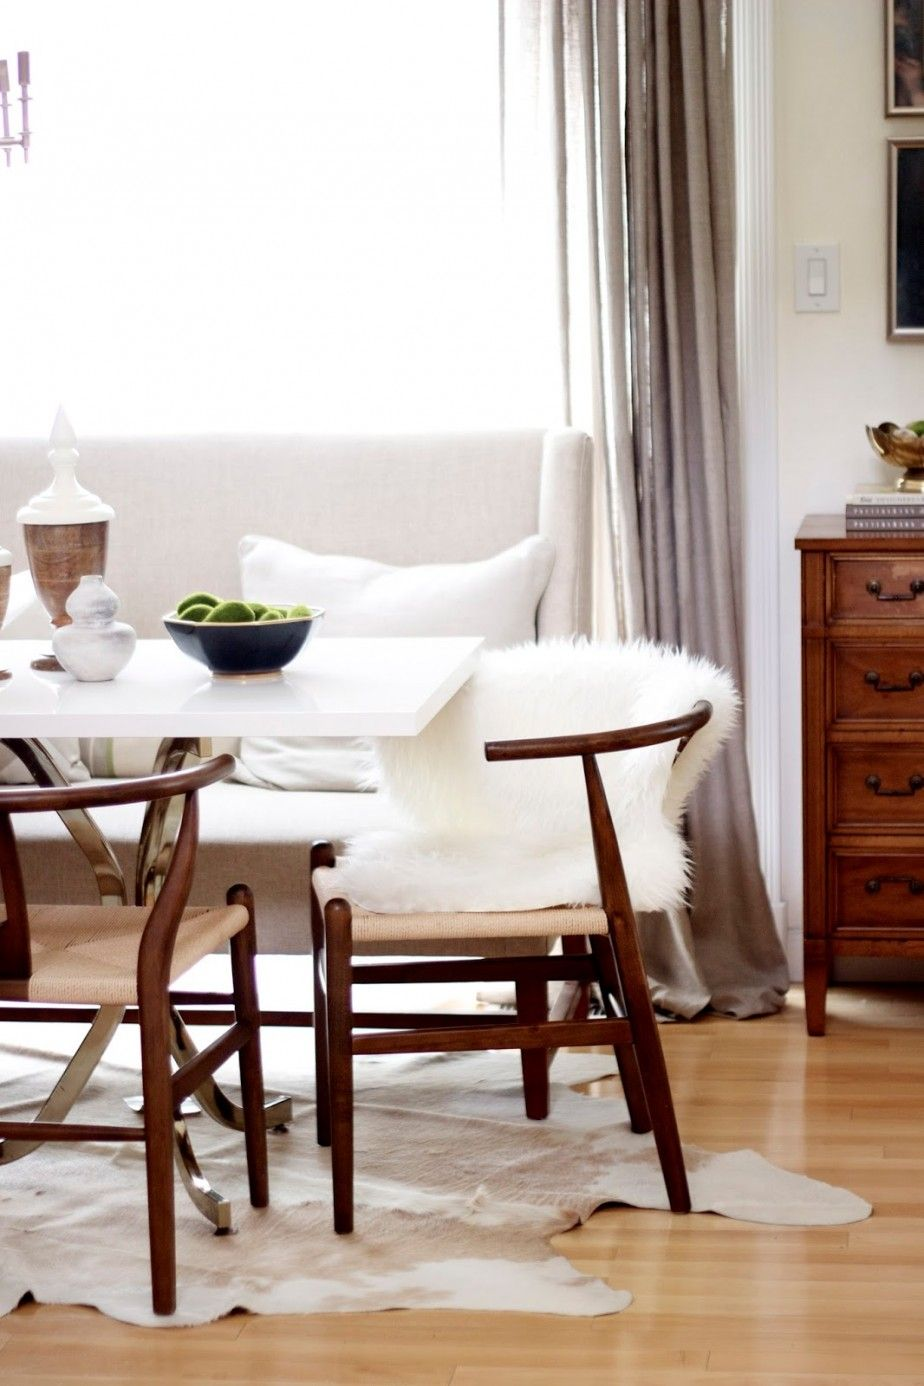 Elegant Dining Room With Minotti Dining Tables